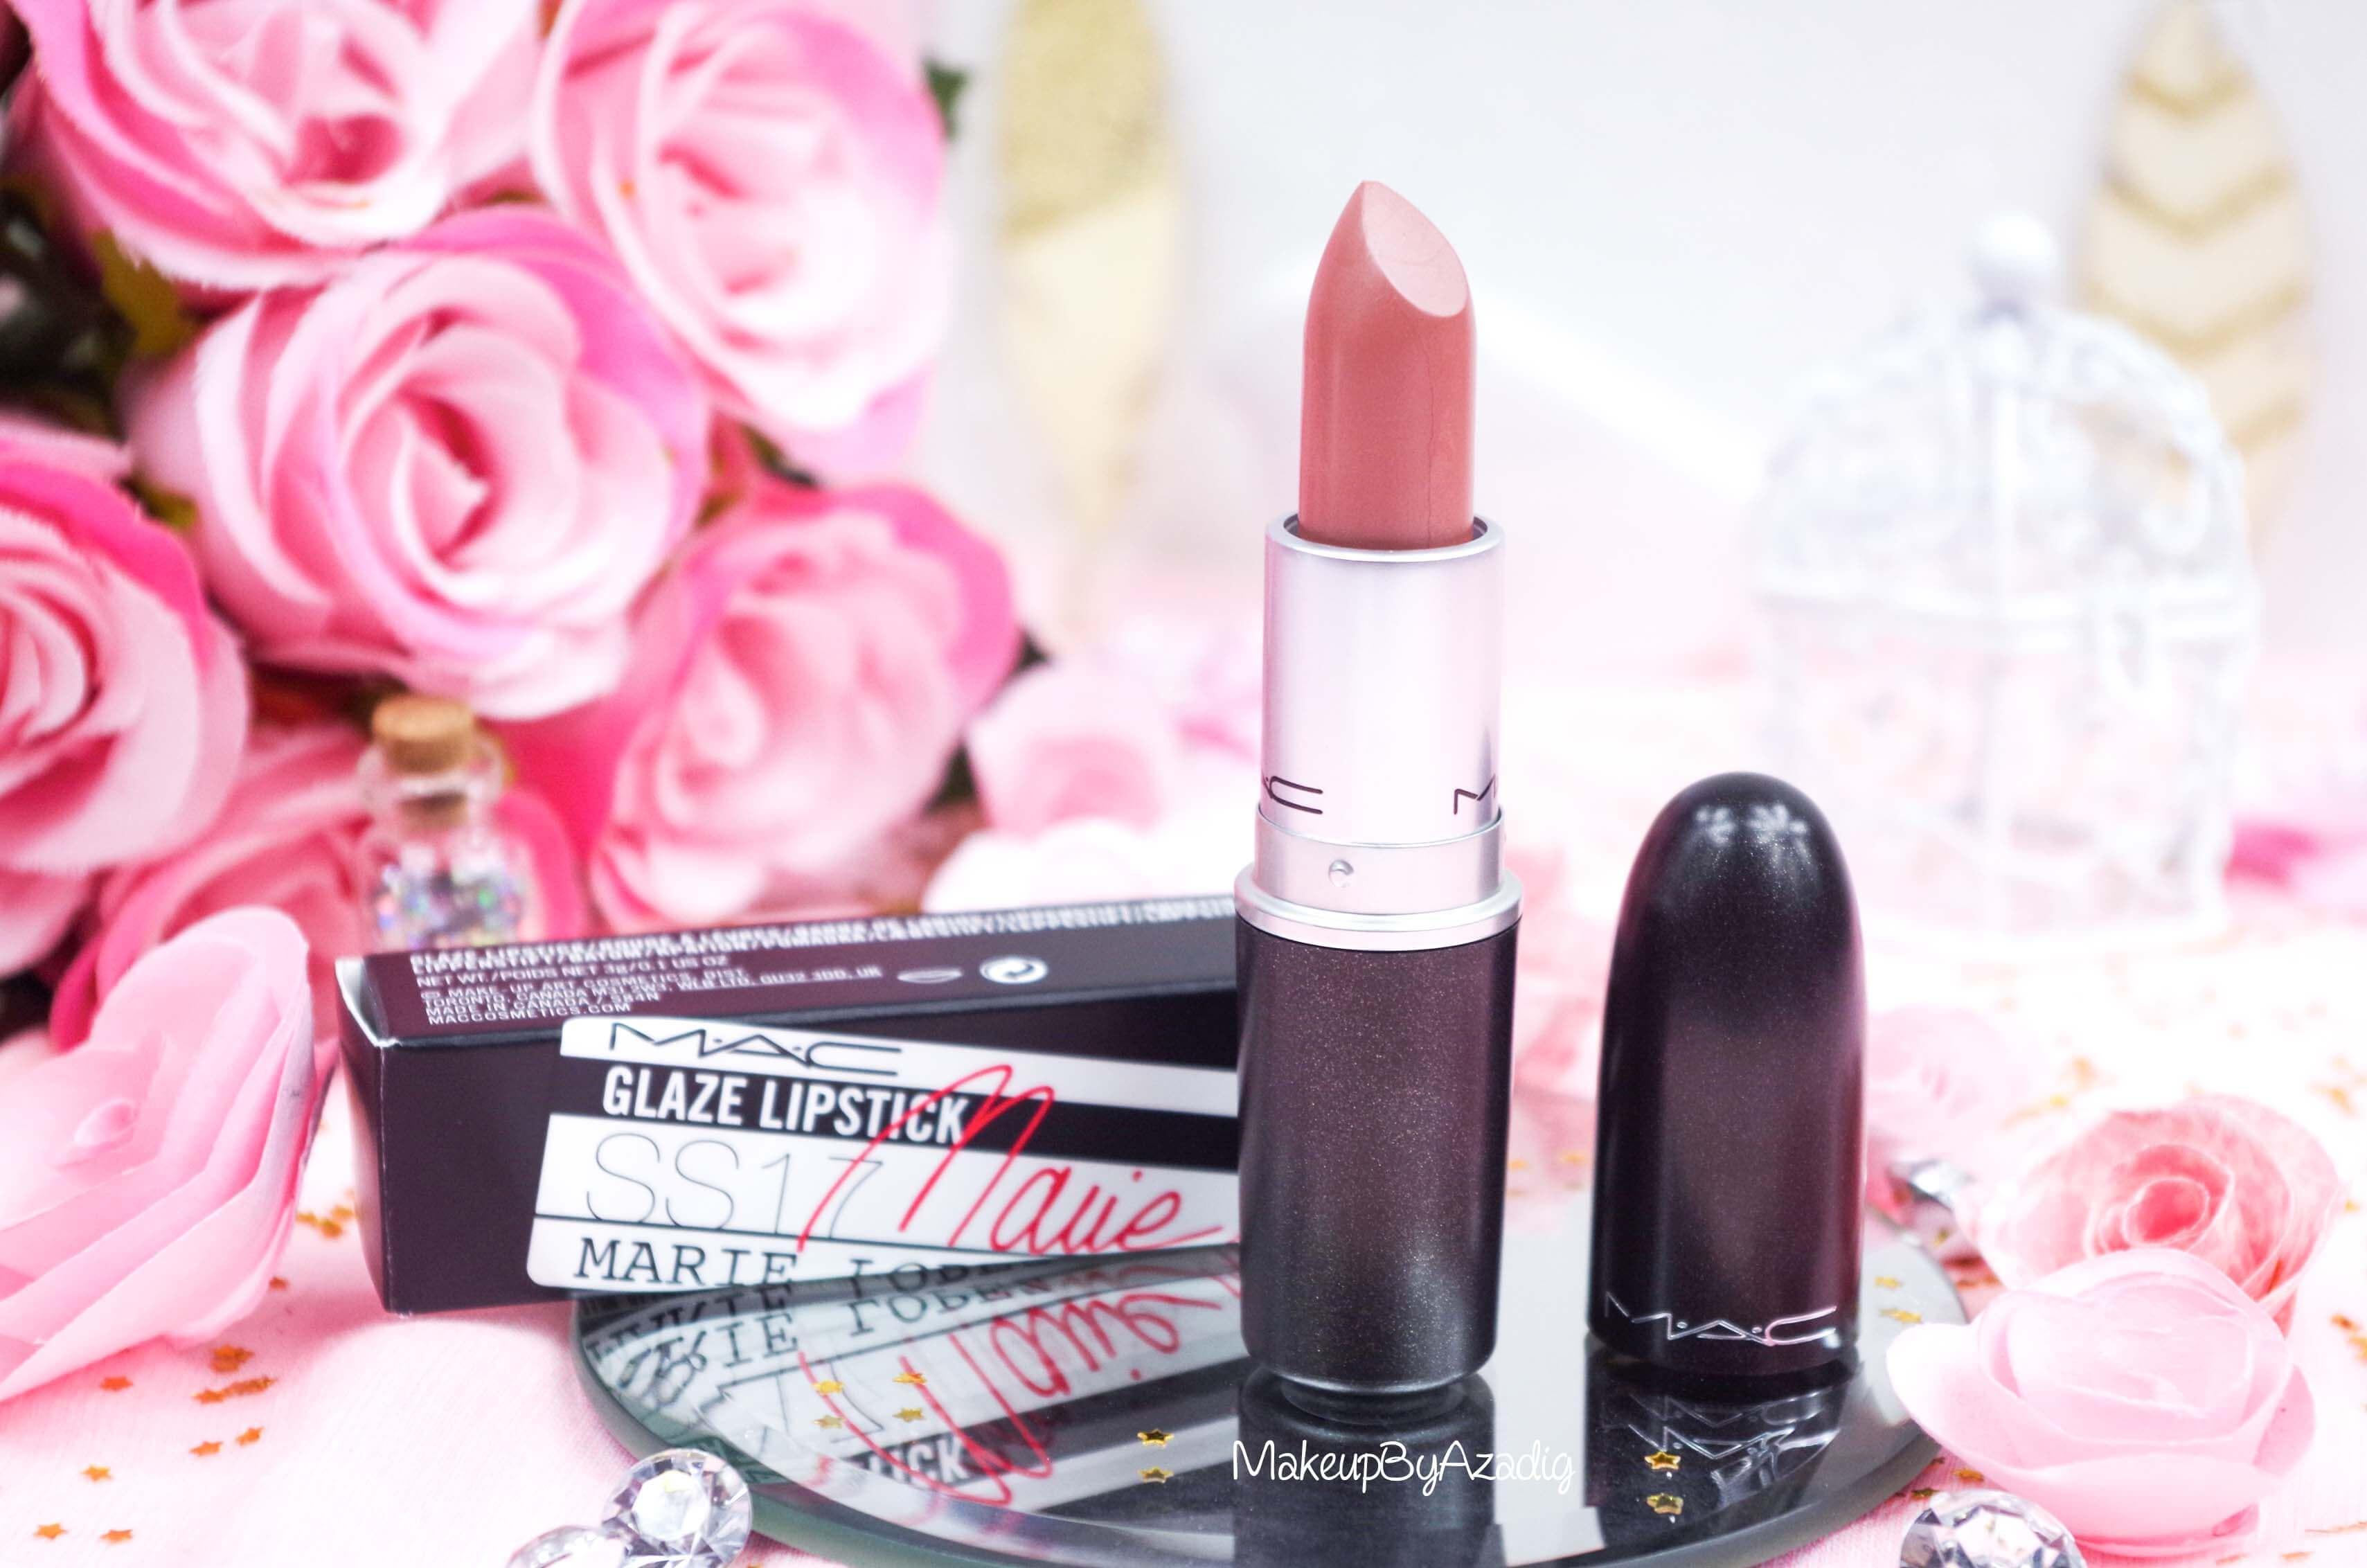 vanille-macxmarie-mac-cosmetics-rouge-a-levres-enjoy-phoenix-collaboration-makeupbyazadig-revue-avis-prix-meetup